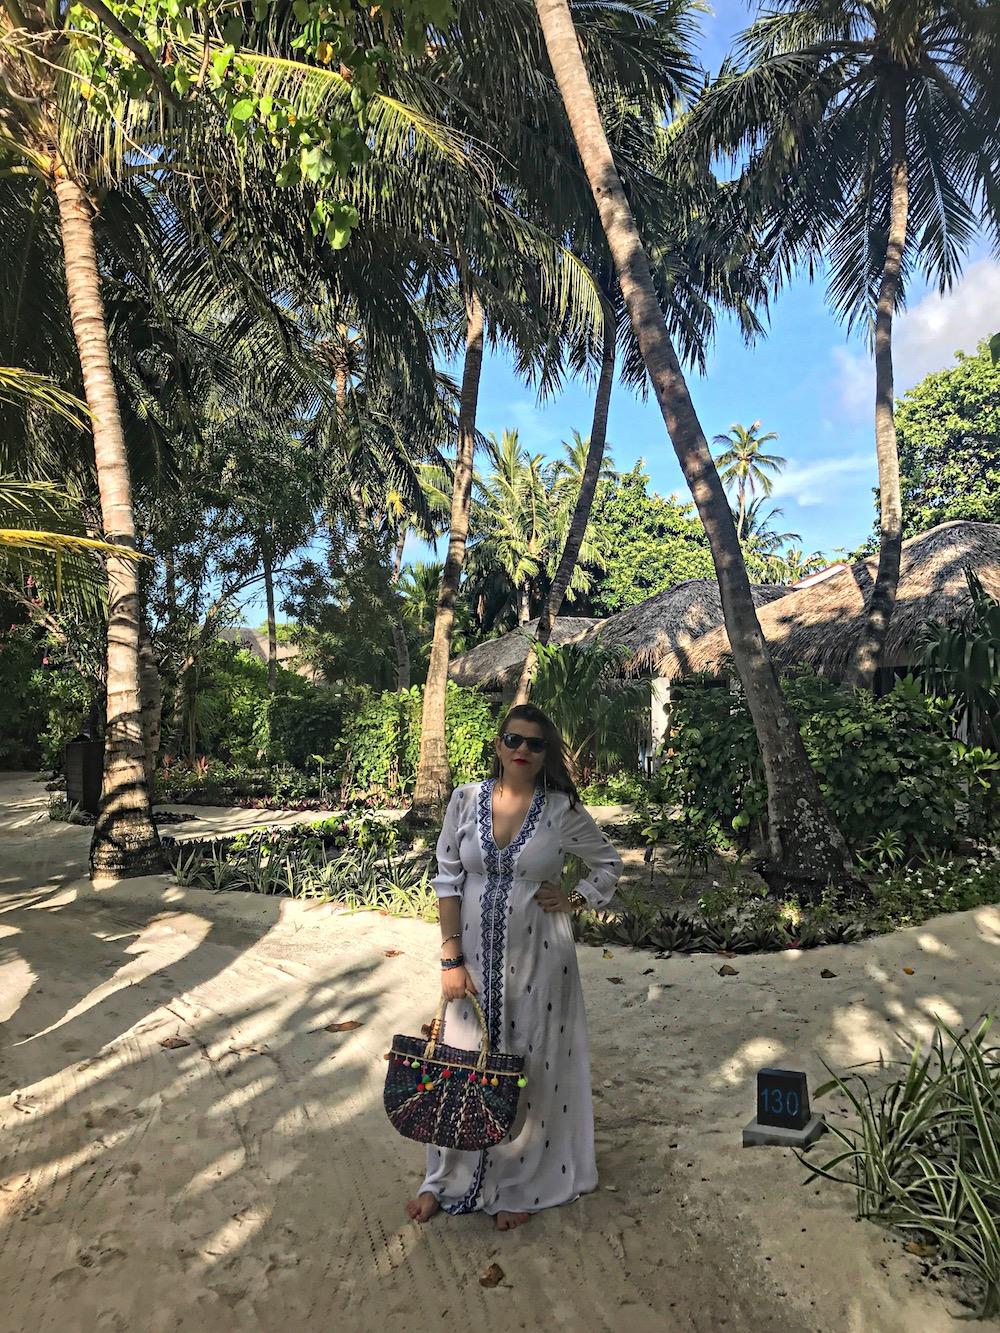 velassaru-maldives-alley-girl-fashion-travel-life-style-blog